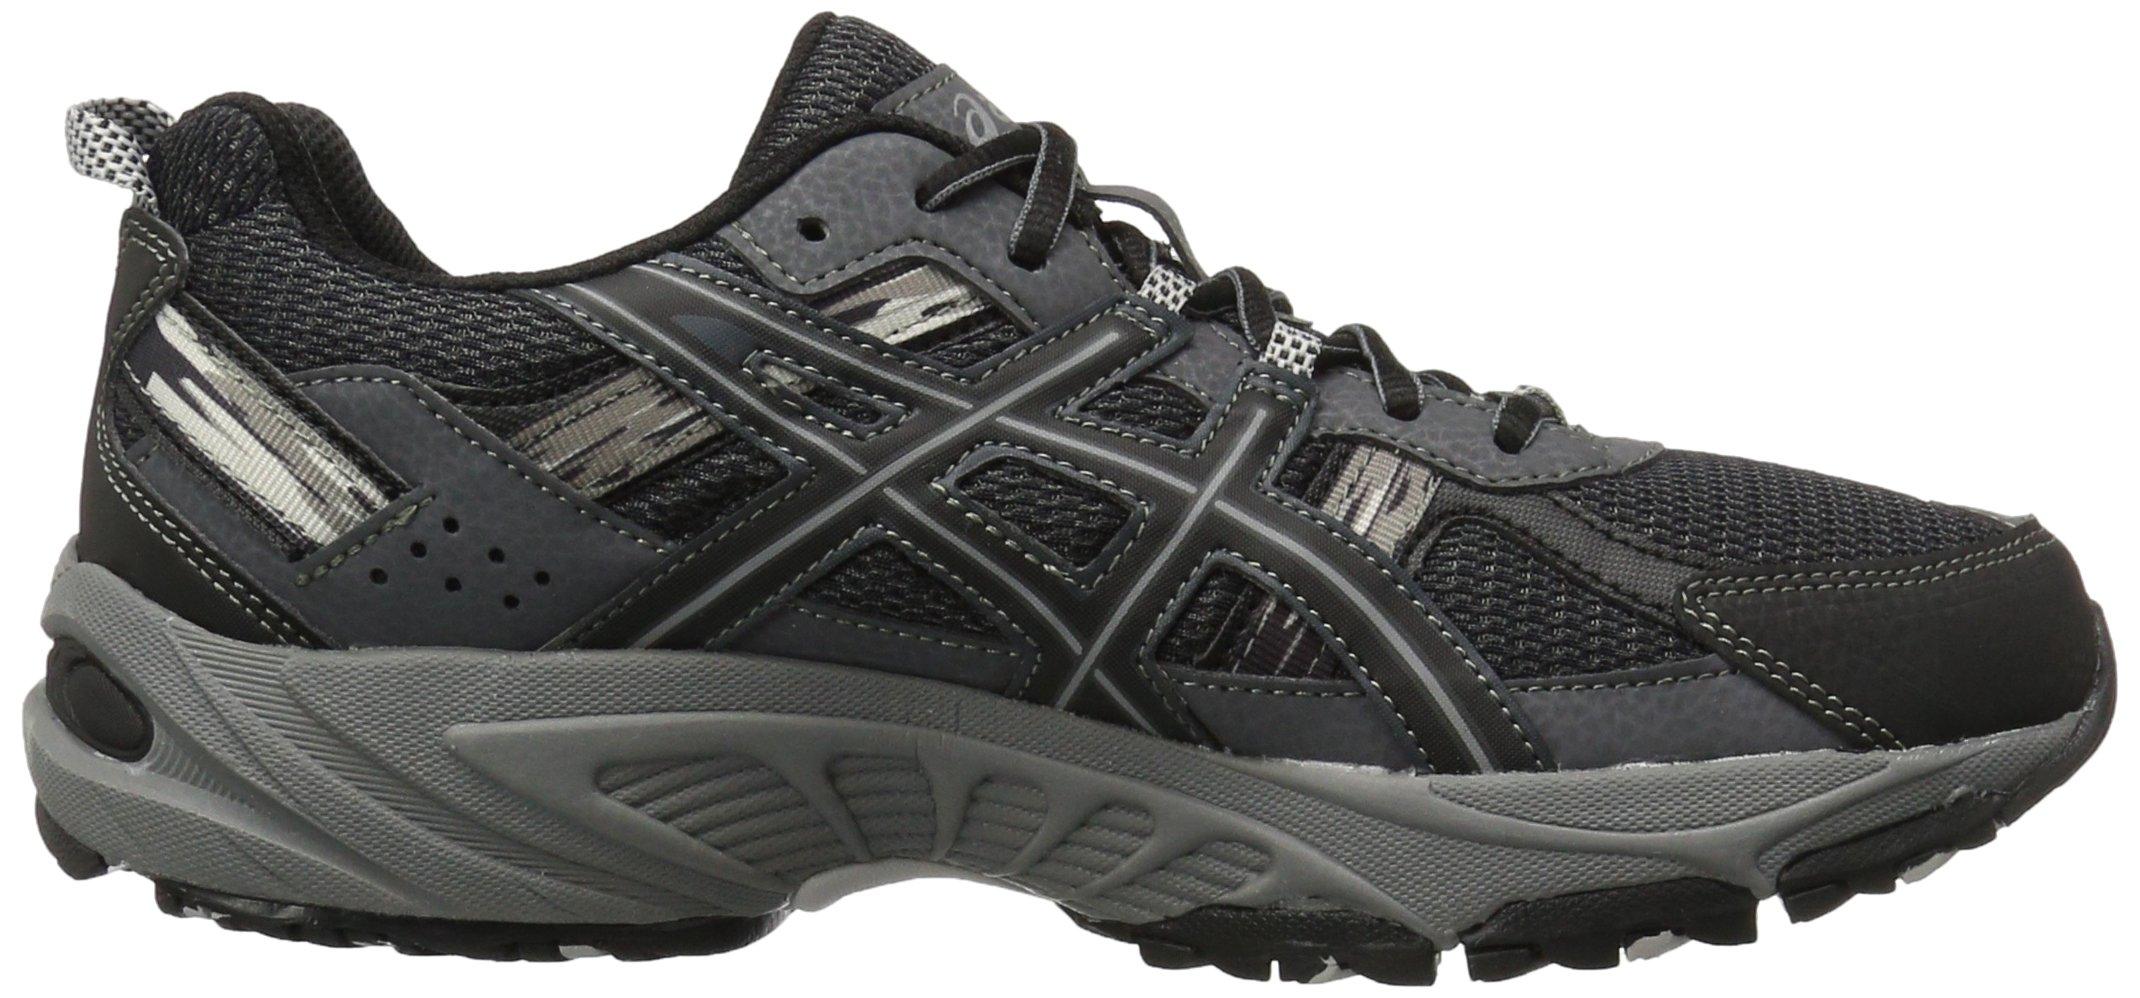 ASICS Men's Gel-Venture 5-M, Black/Onyx/Charcoal, 8 M US by ASICS (Image #7)